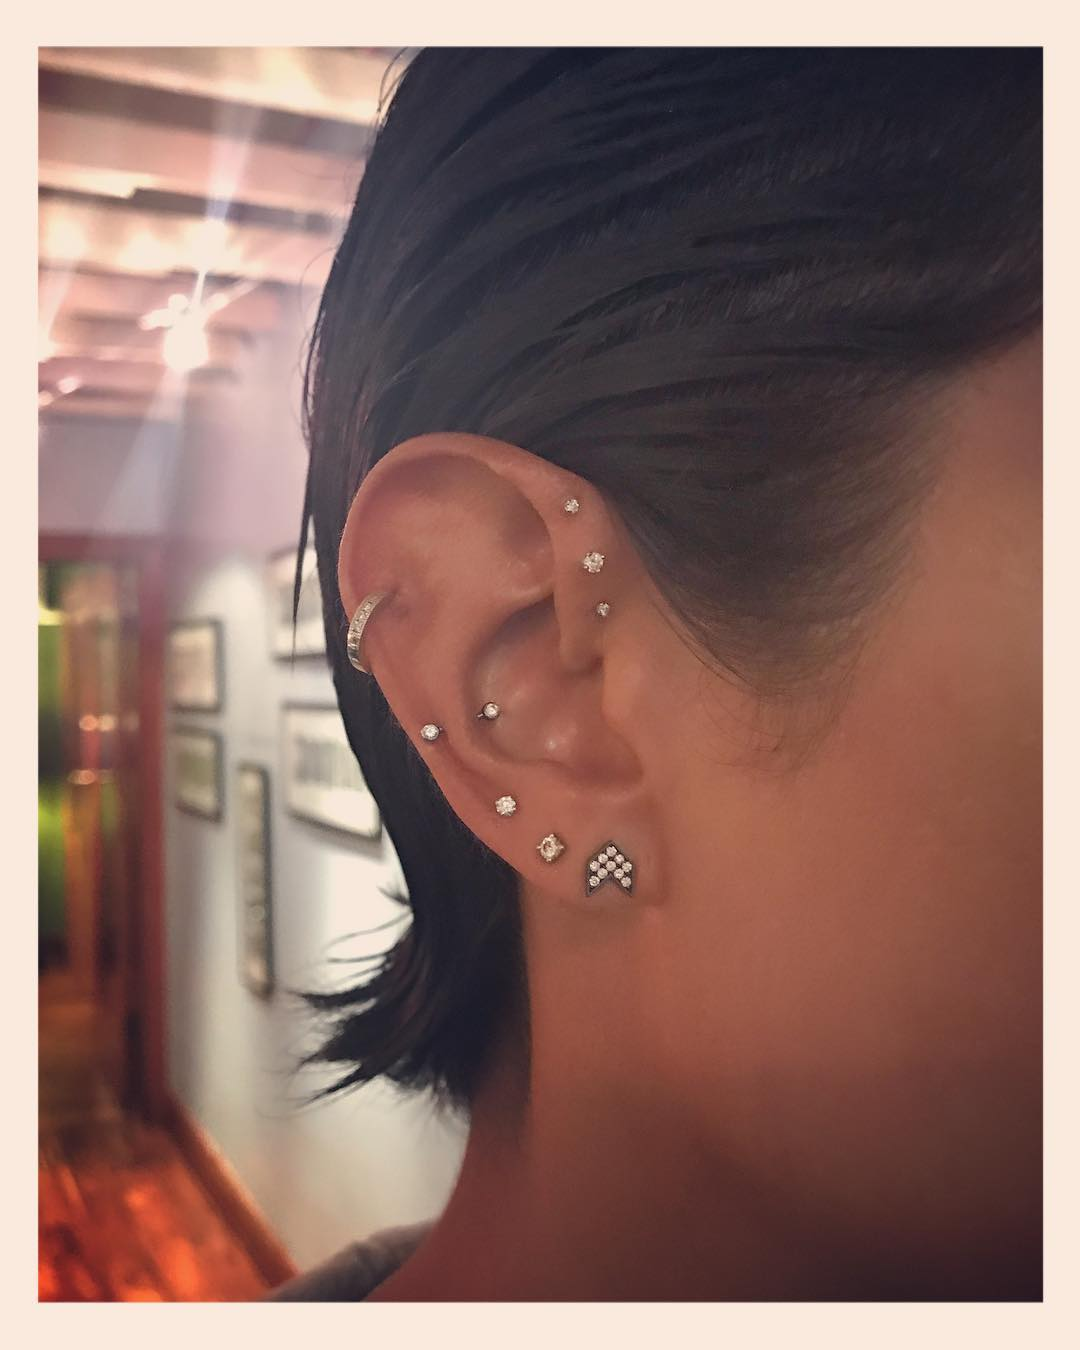 Piercings na orelha brilhantes